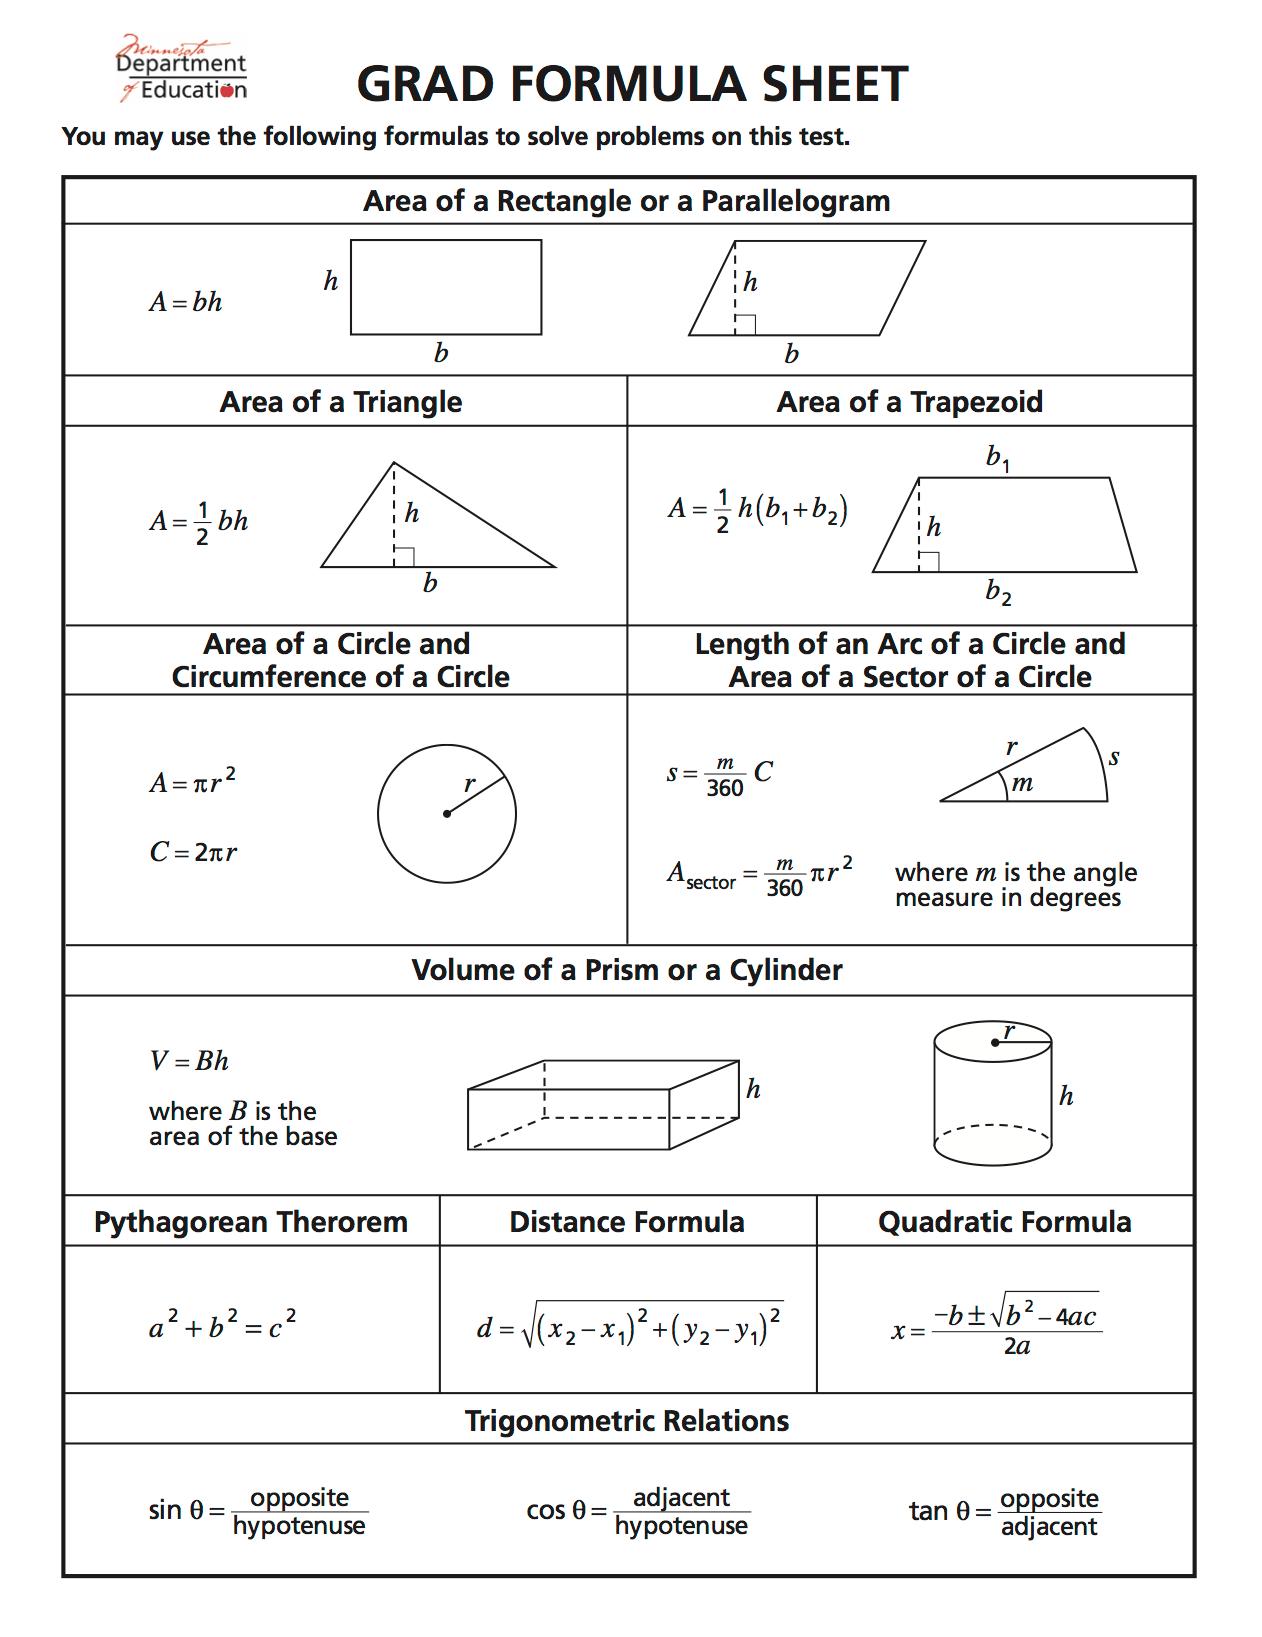 Online Math Test For Grade 10